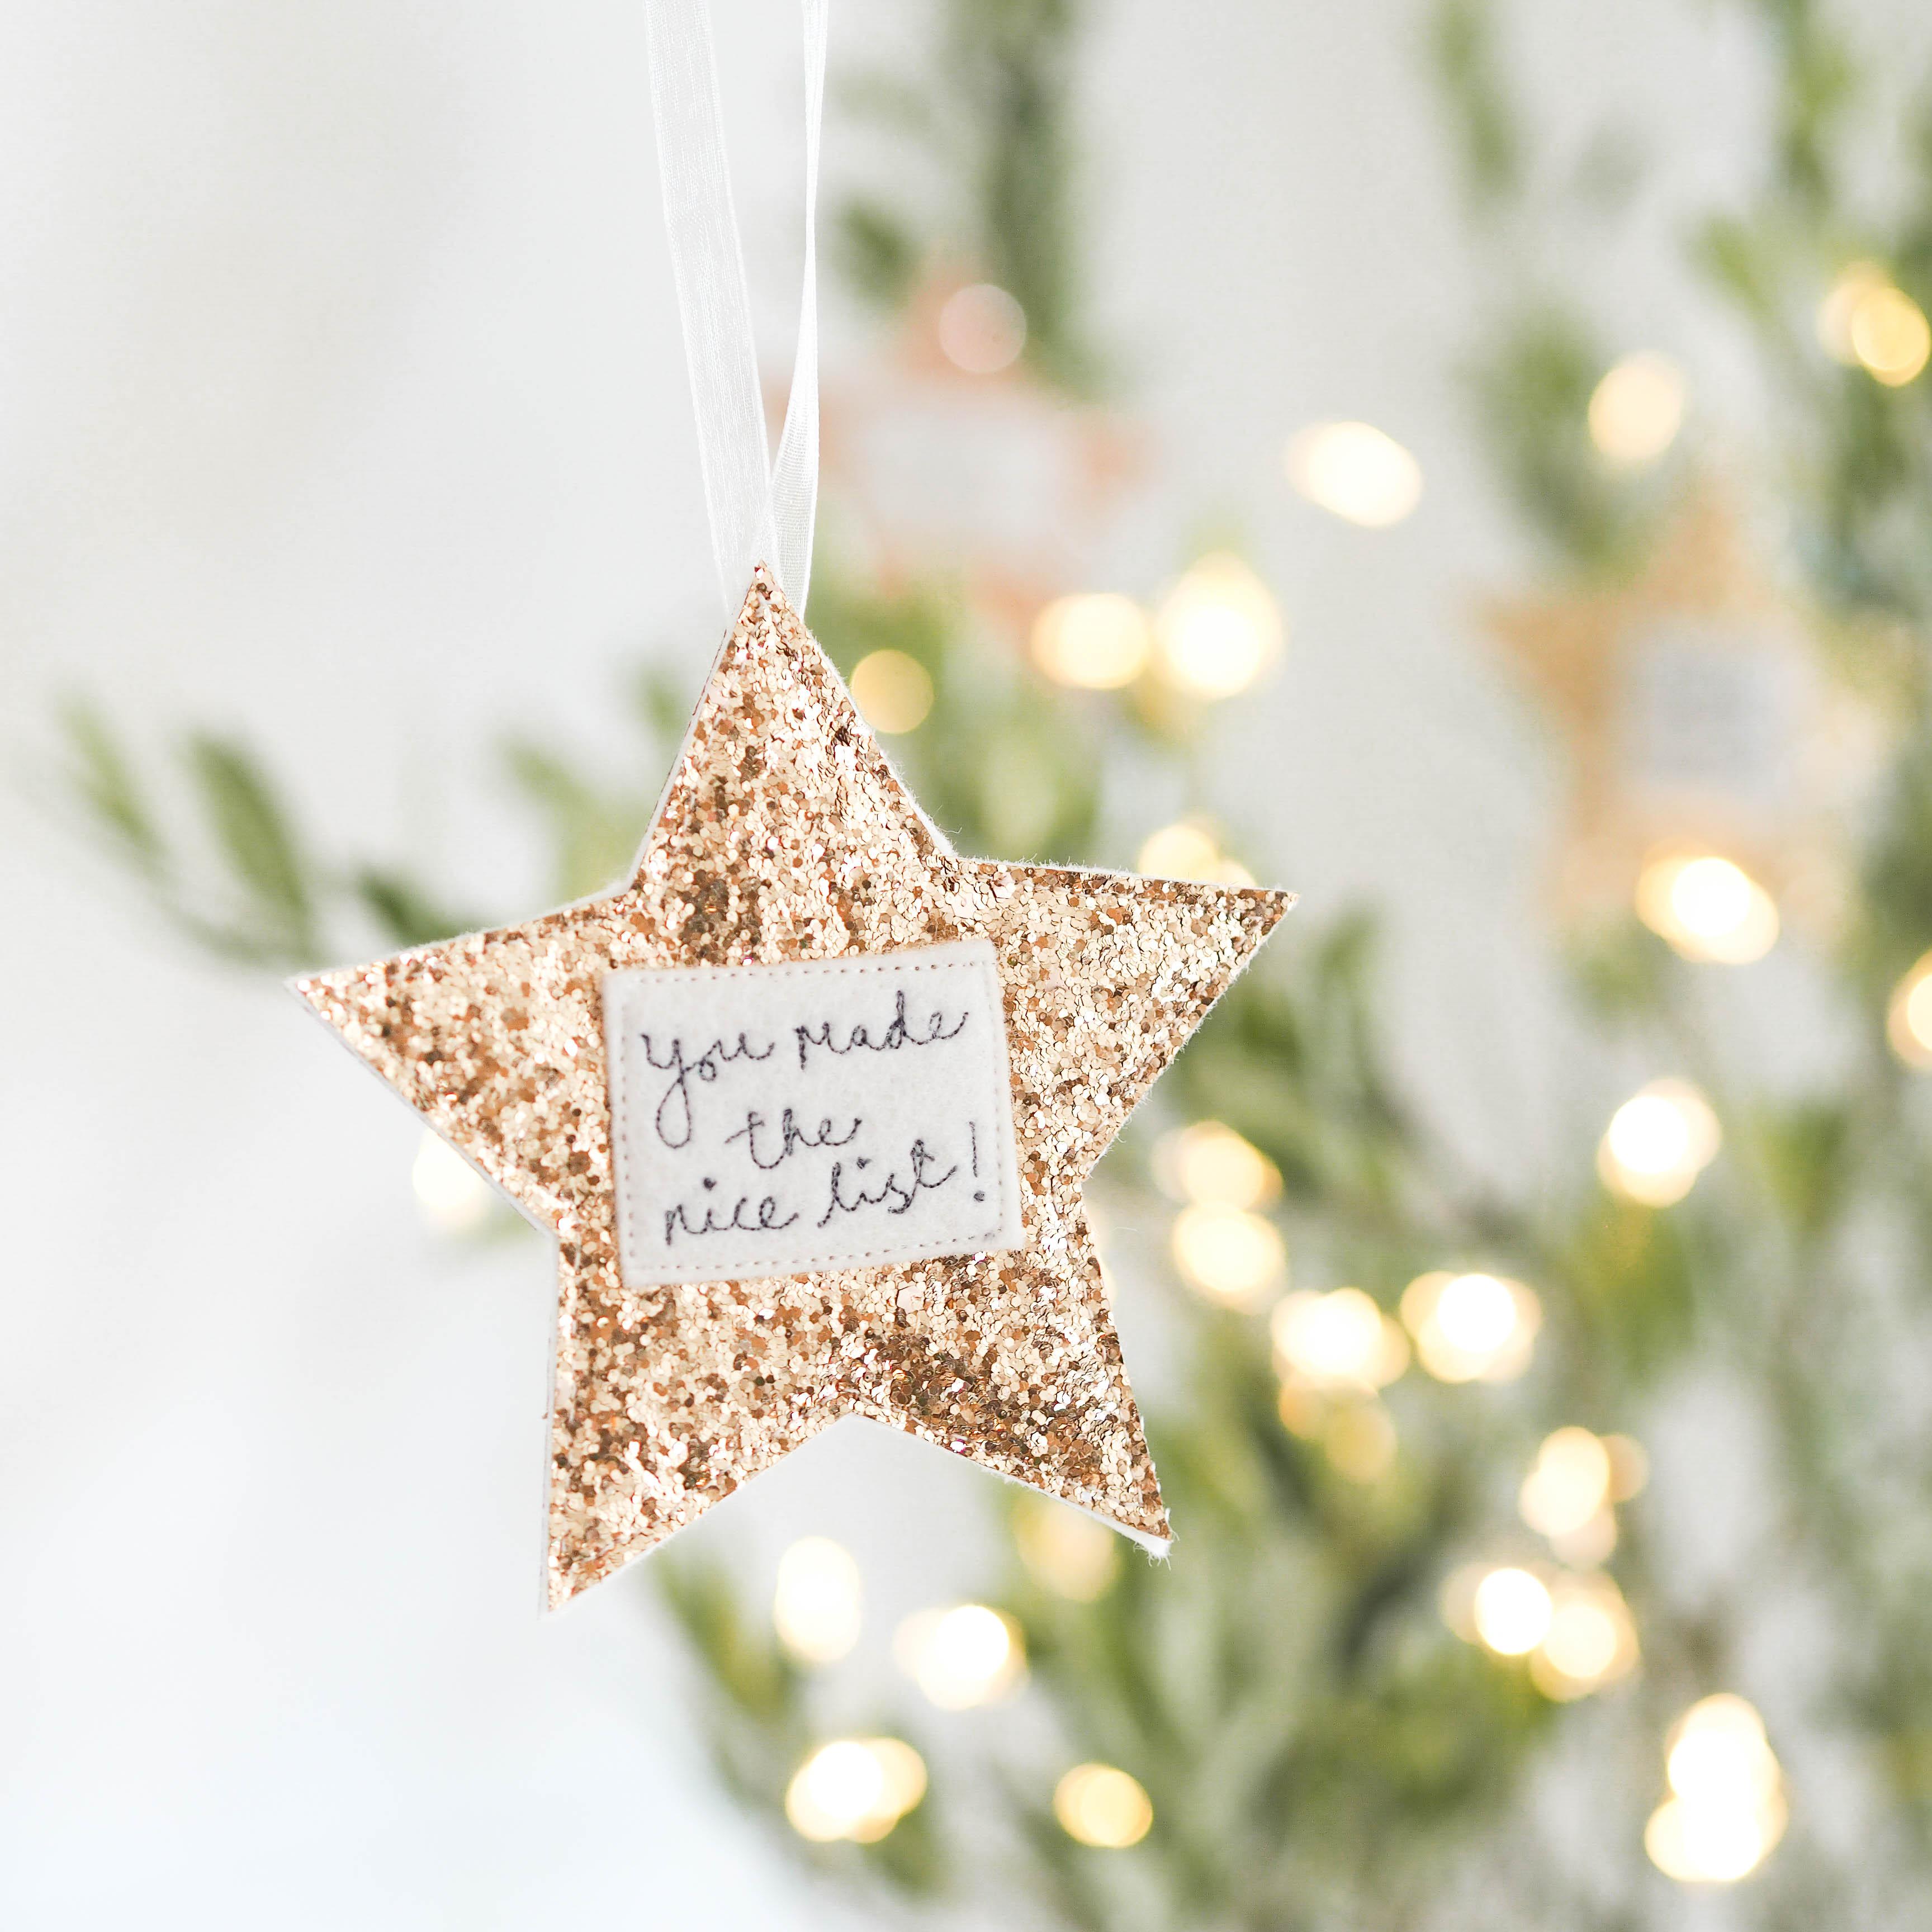 Nice list, Christmas Eve box decorations.